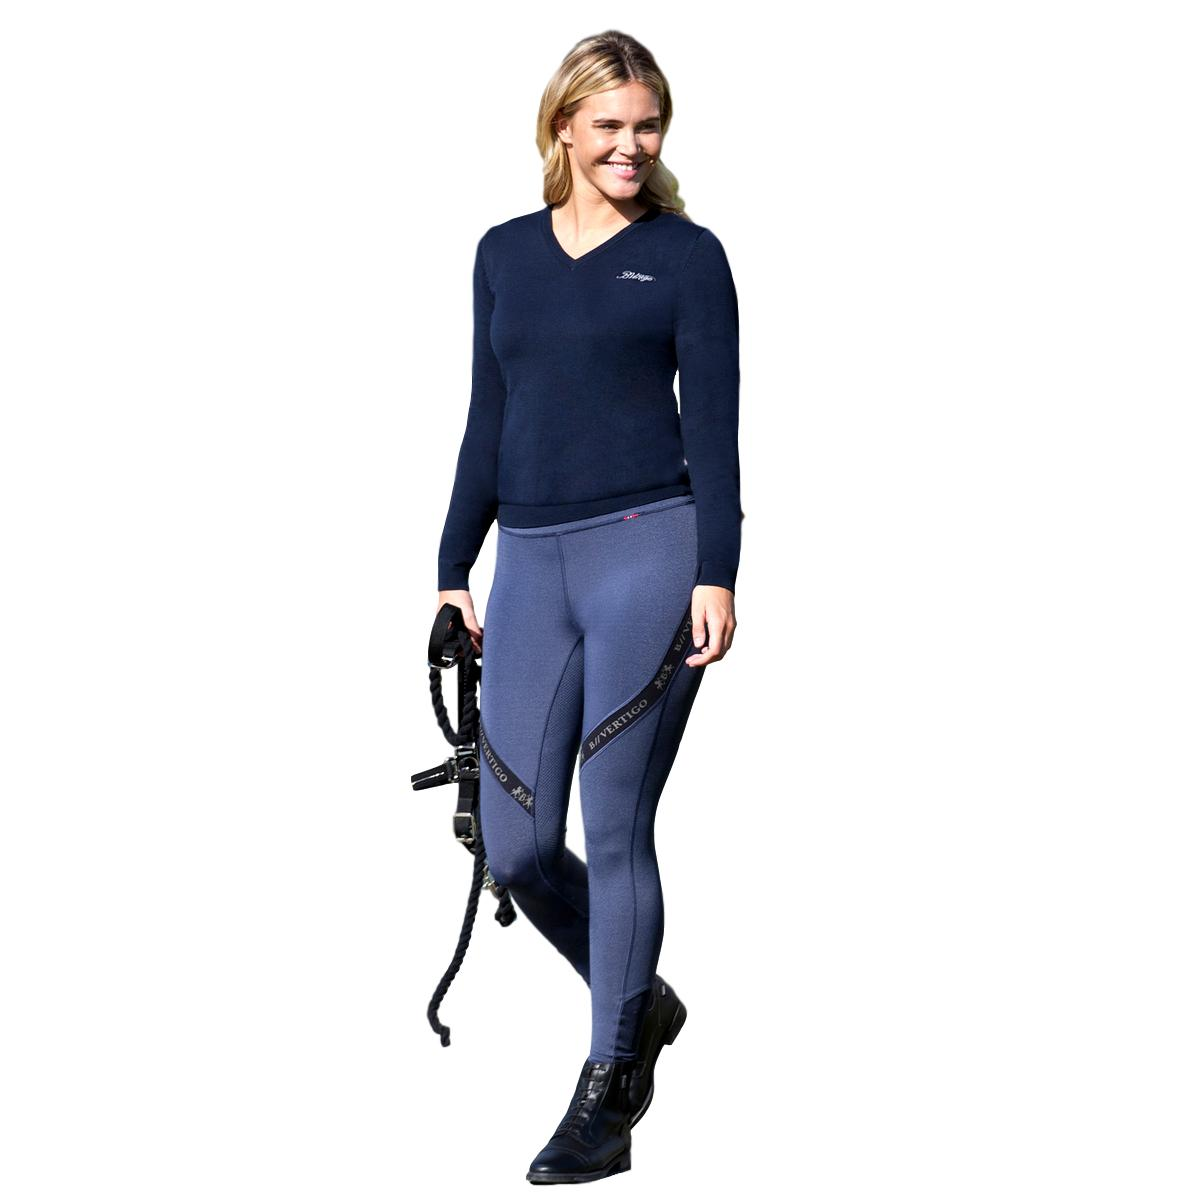 B Vertigo Jenny Ultra Comfort Quick Dry Womens Silicone Full Seat Riding Tights